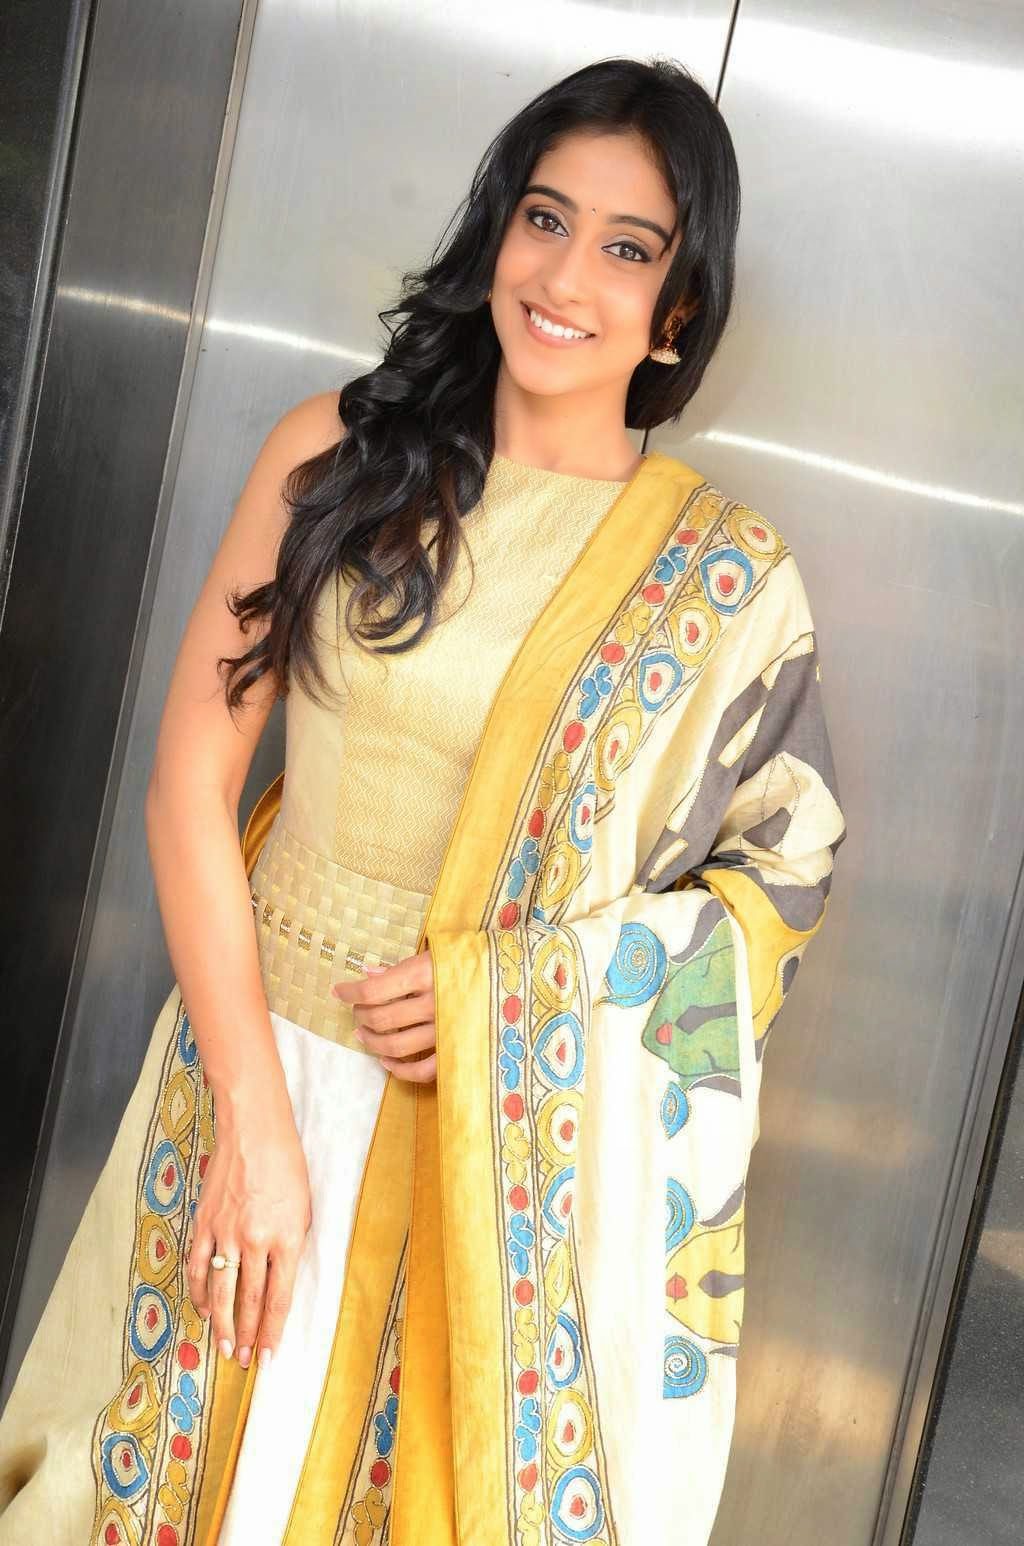 Actress Regina Cassandra Latest Cute Hot Exclusive Beautiful Yellow Dress Spicy Photos Gallery At Subramanyam For Sale Telugu Movie Press Meet (2)